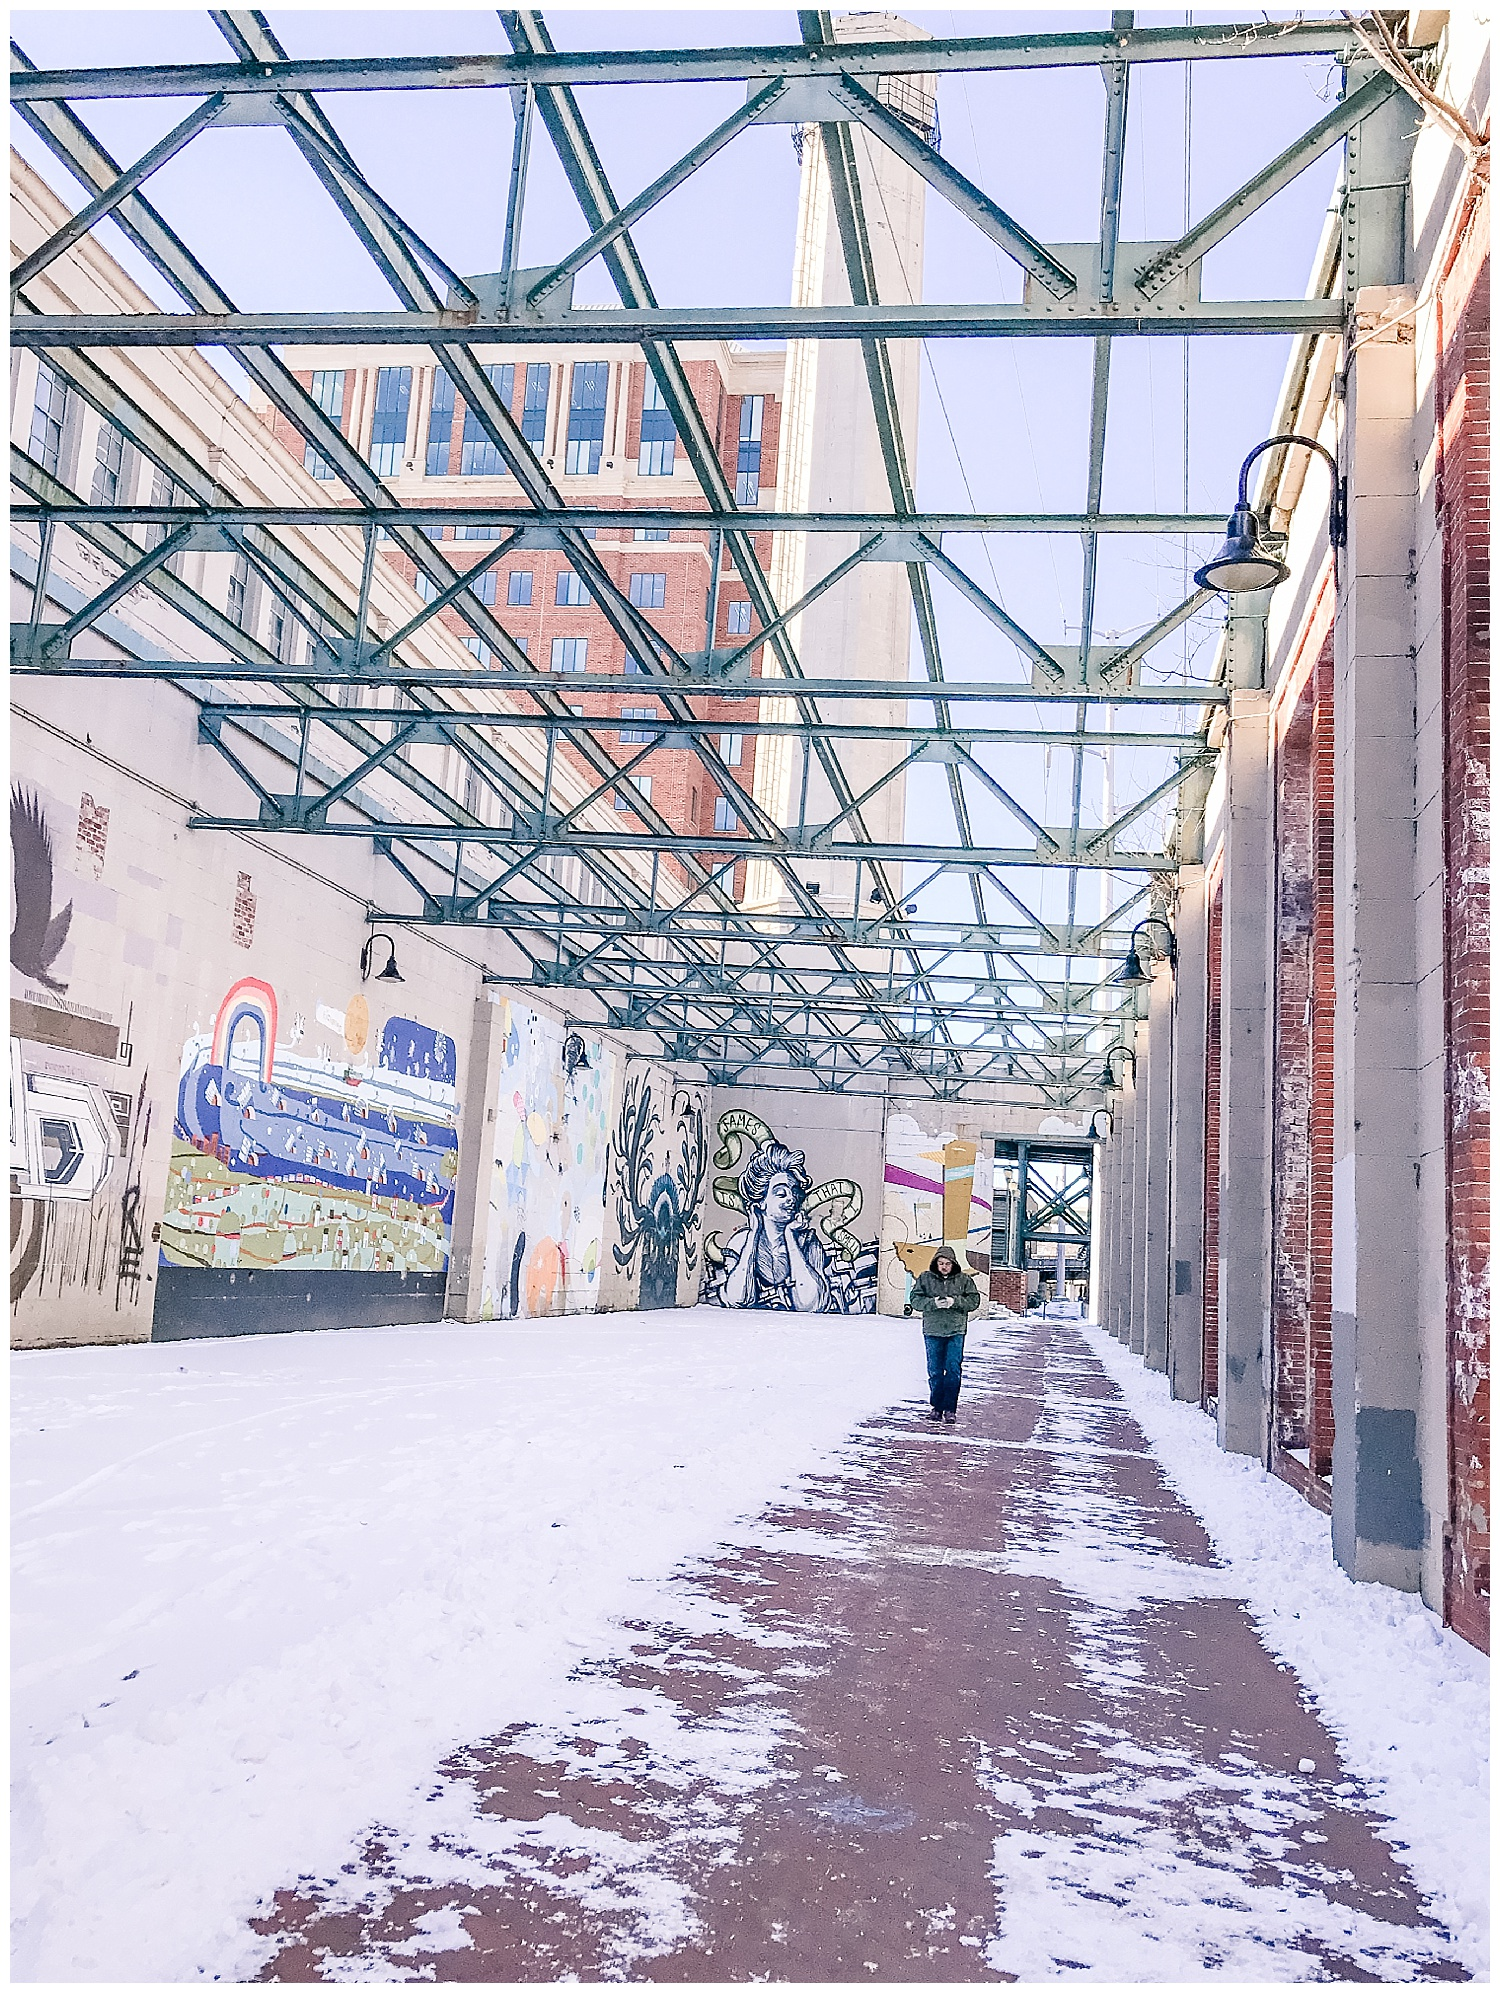 Richmond Canal Walk in Snow - Photographer Stacie Marshall